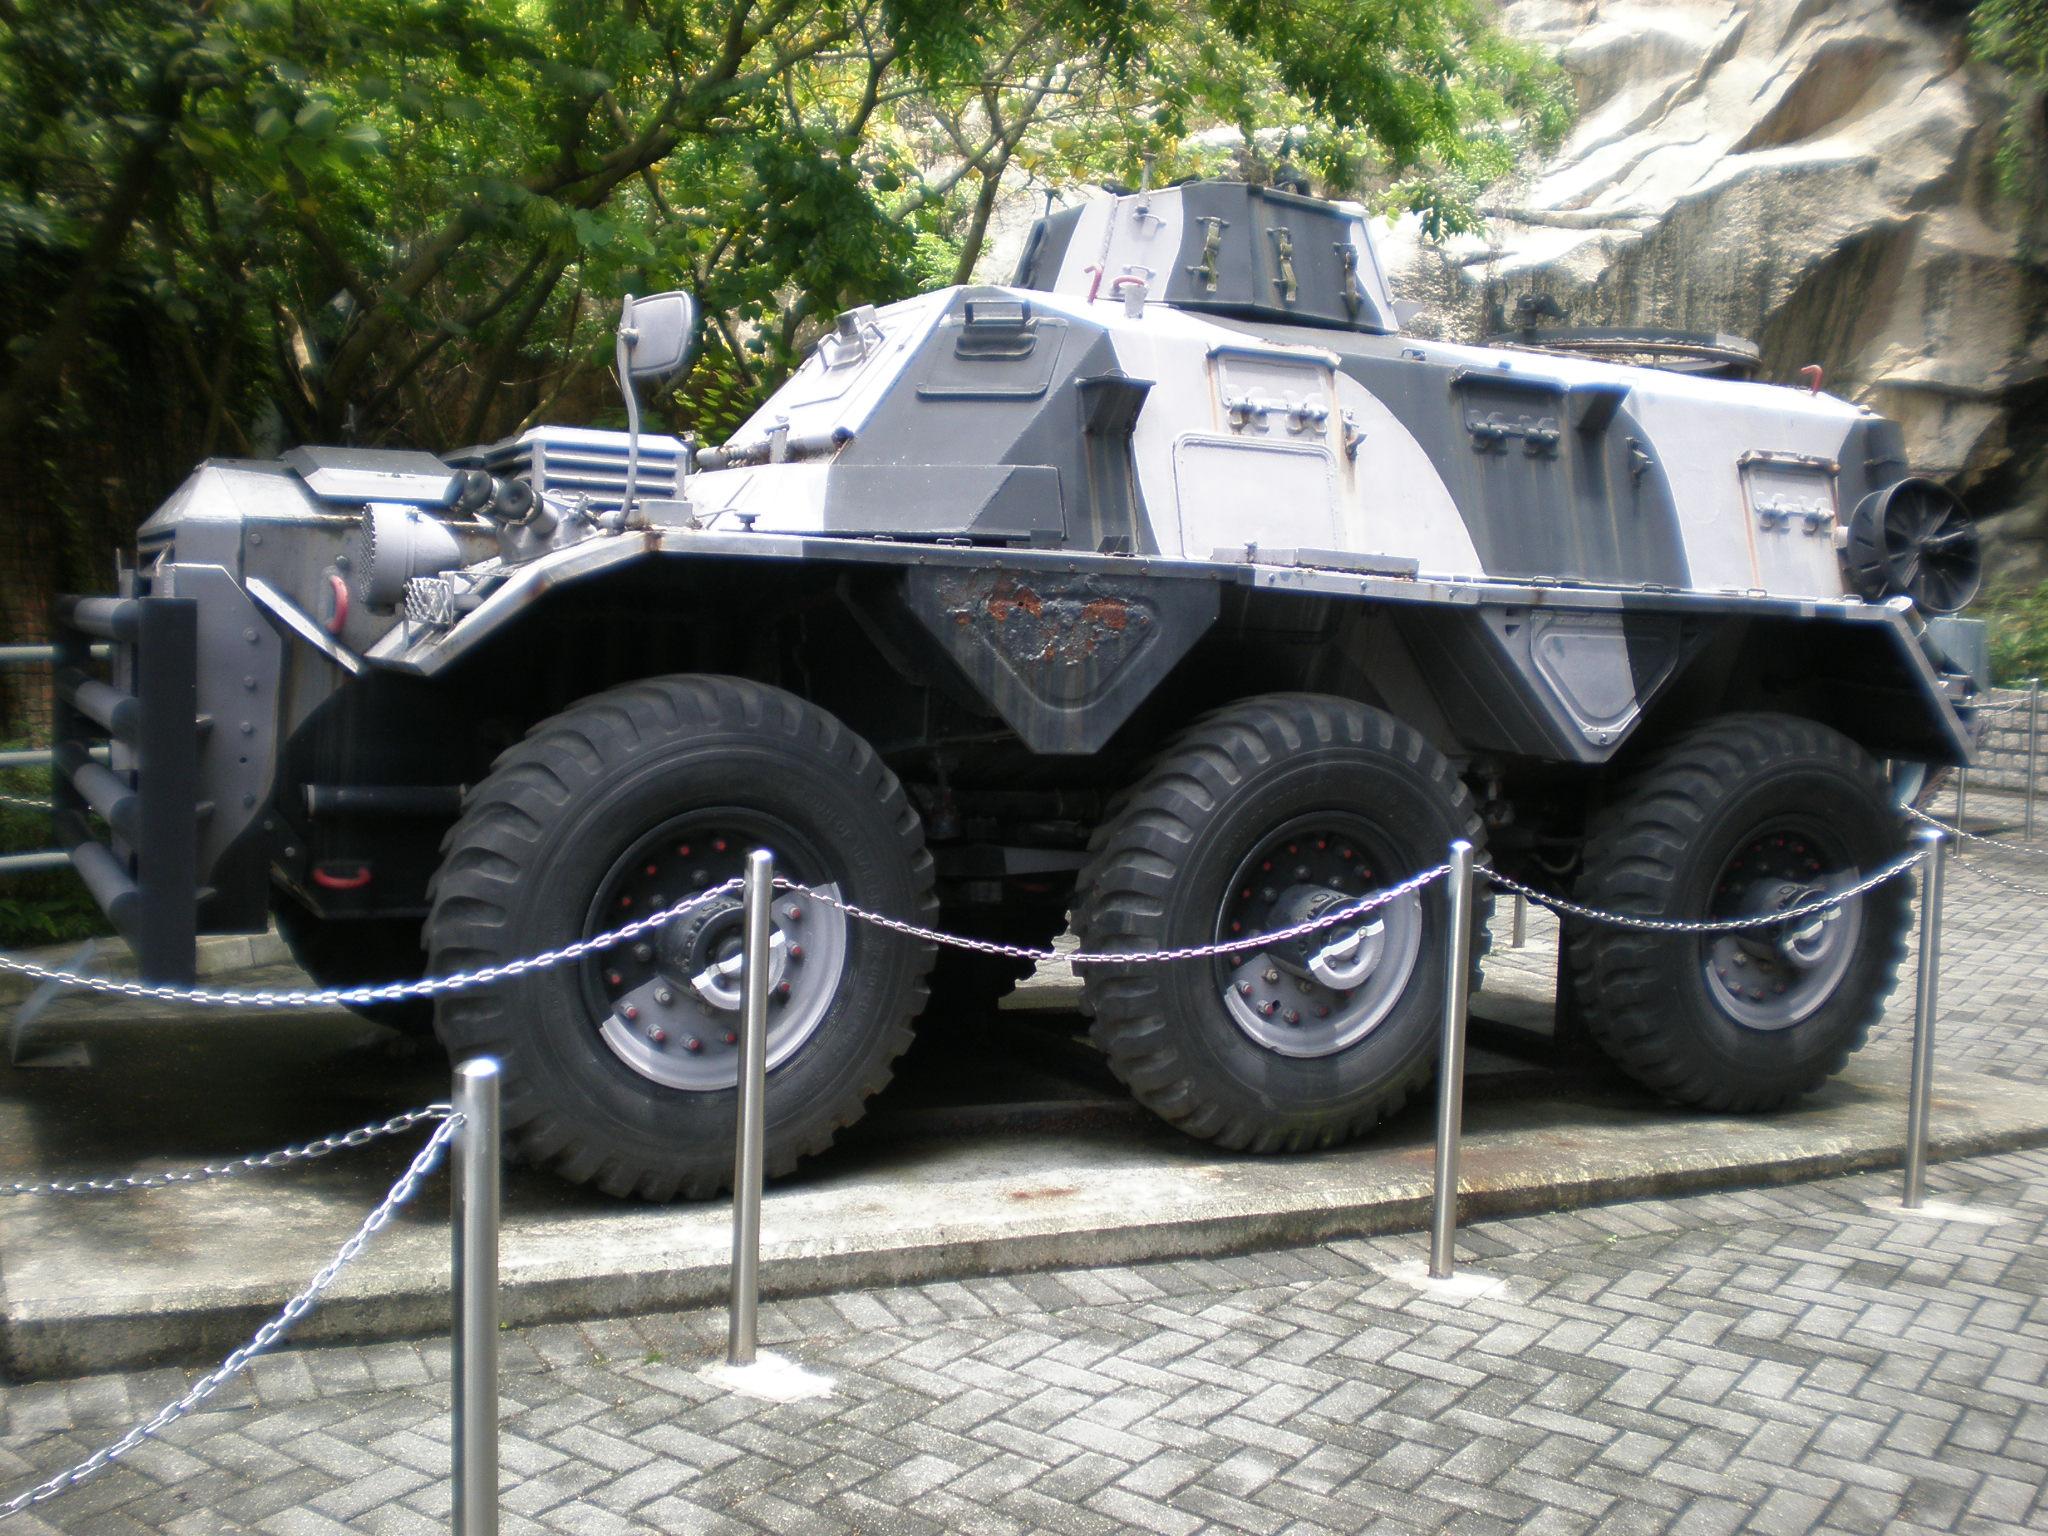 File:Alvis Saracen Mk 2 side HKMCD.JPG - Wikipedia